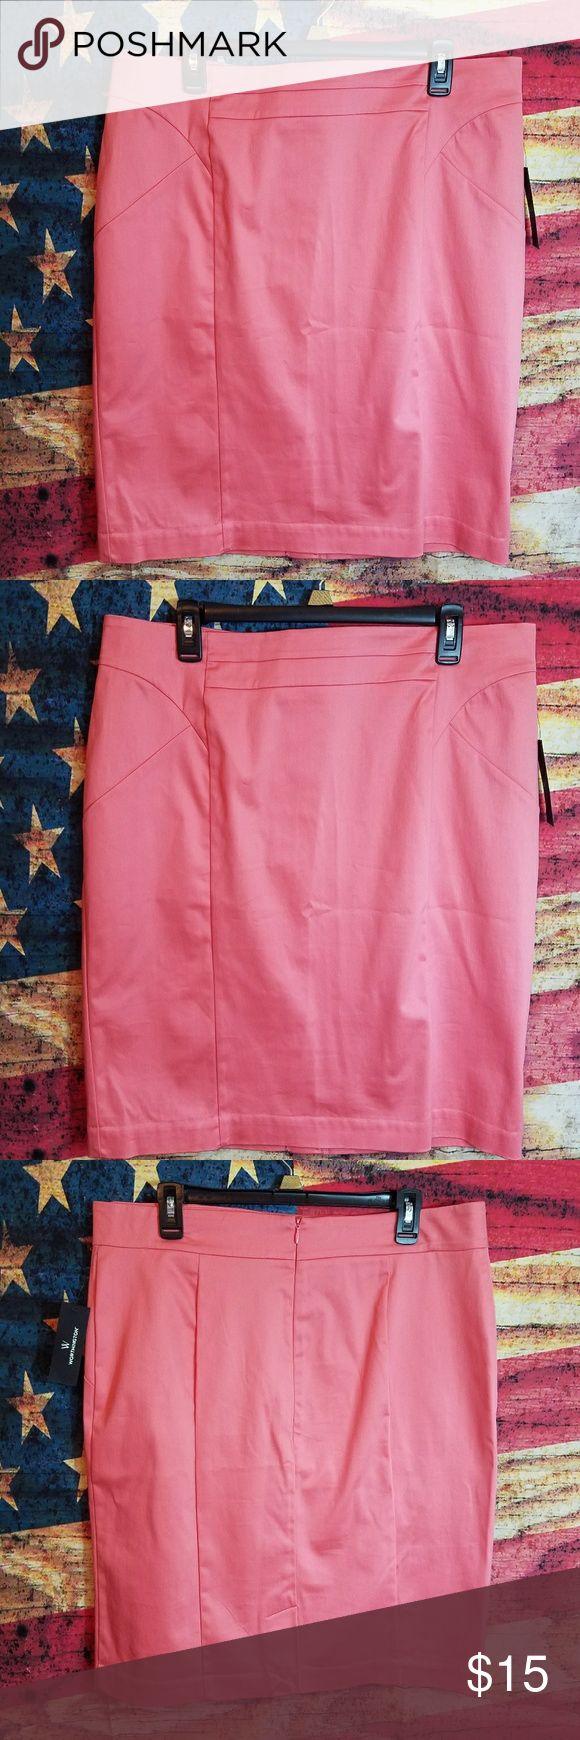 Worthington skirt Coral color skirt size 18 Worthington Skirts Pencil